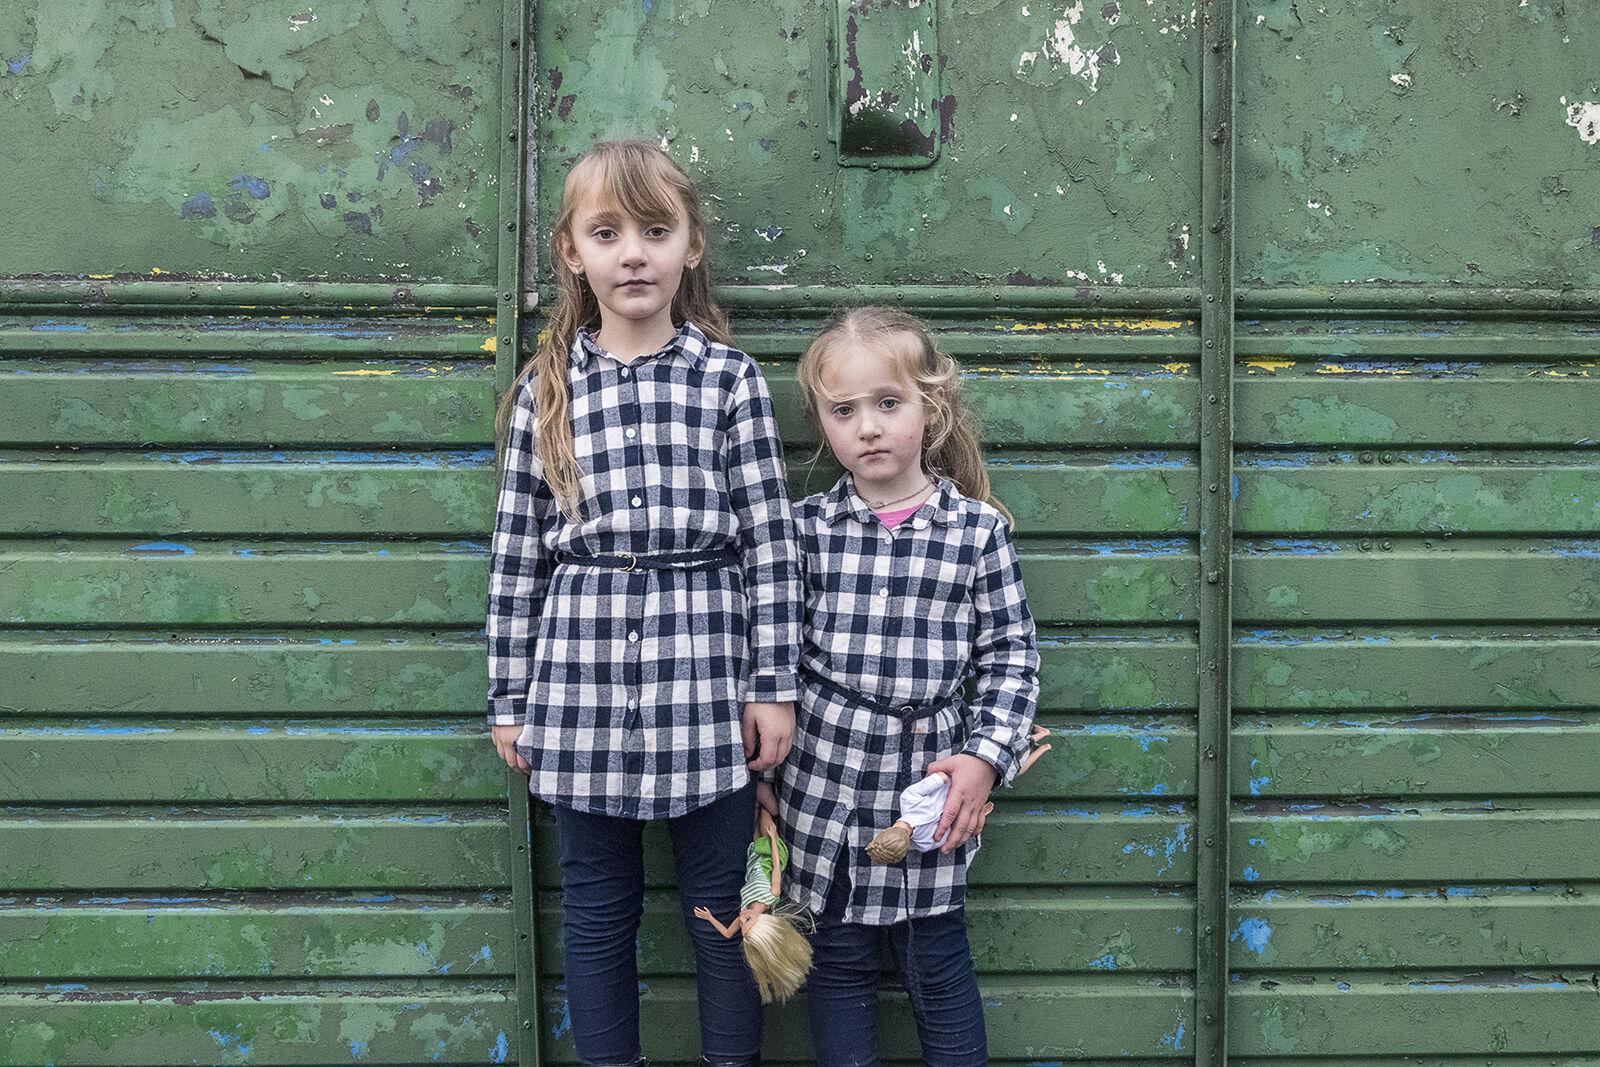 Kathleen and Melissa, Tipperary, Ireland 2018